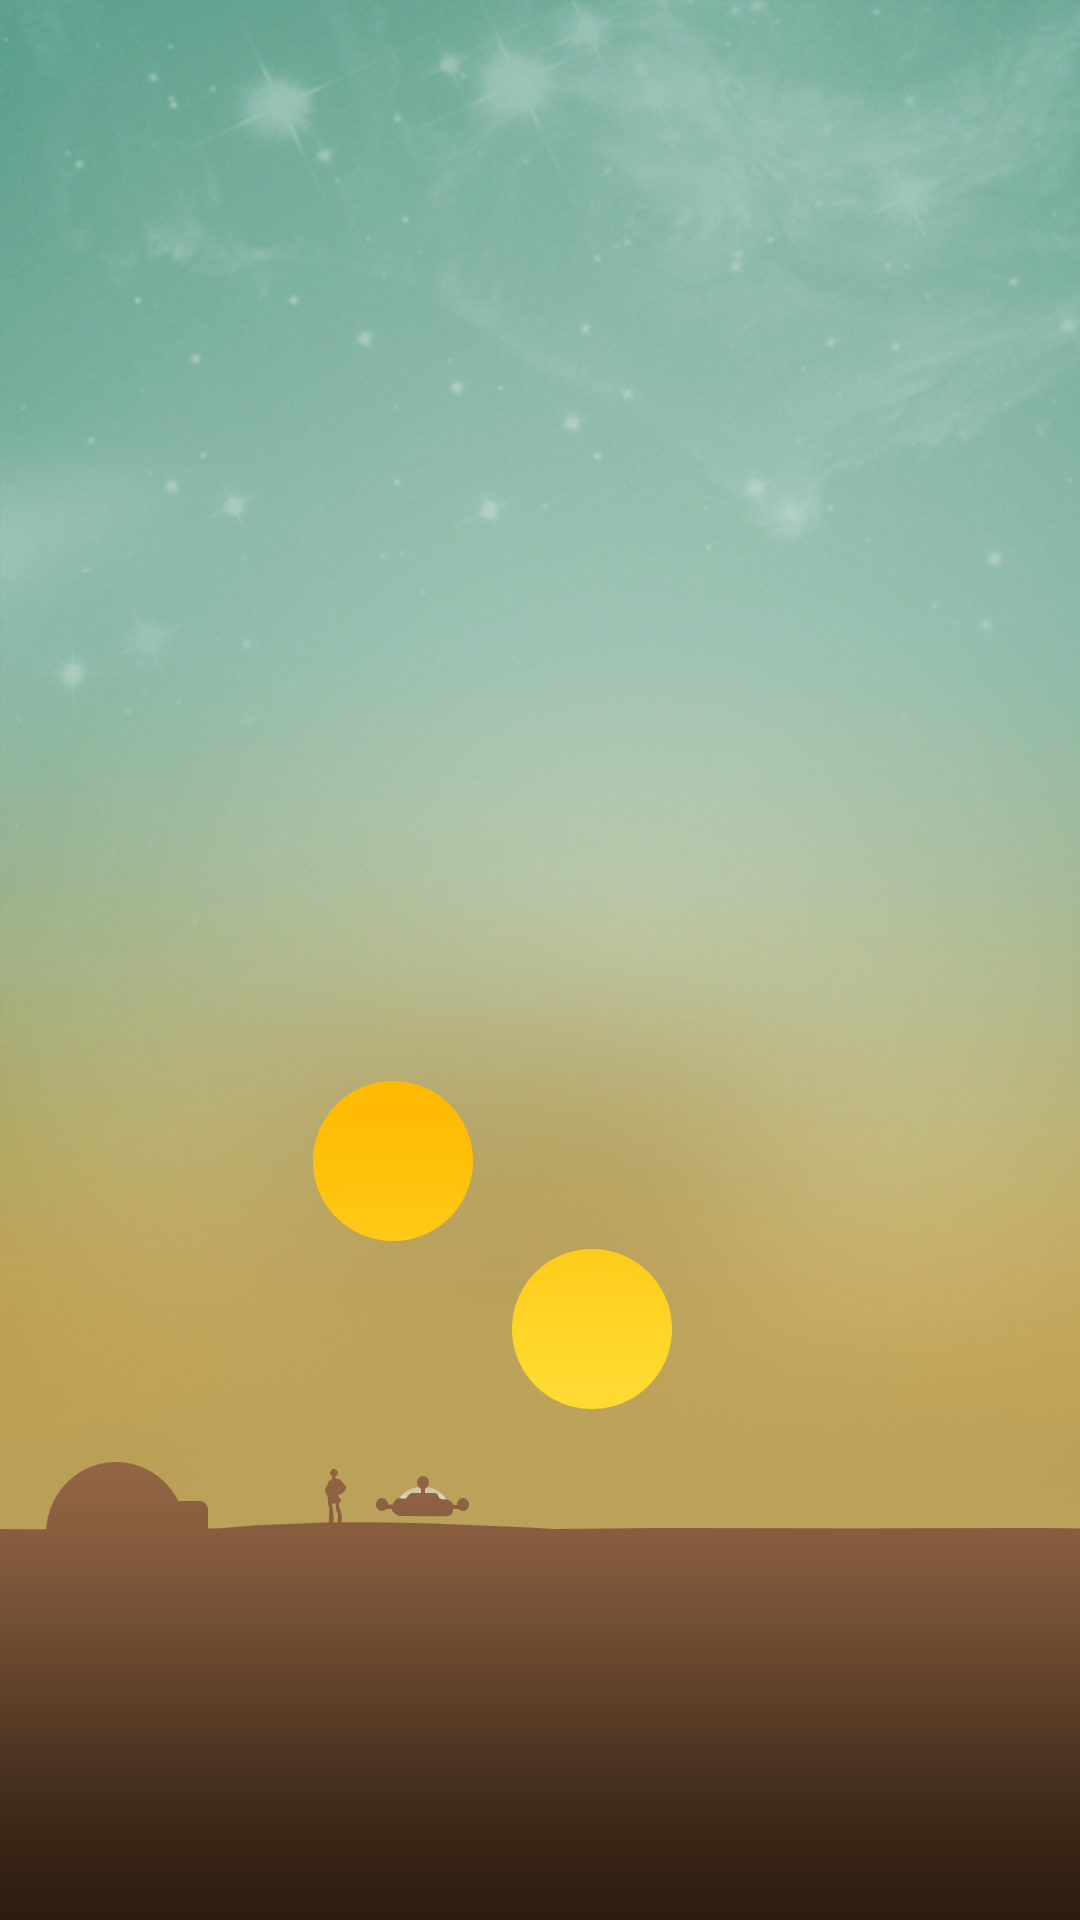 Starwars Phone Wallpaper Posted By John Mercado